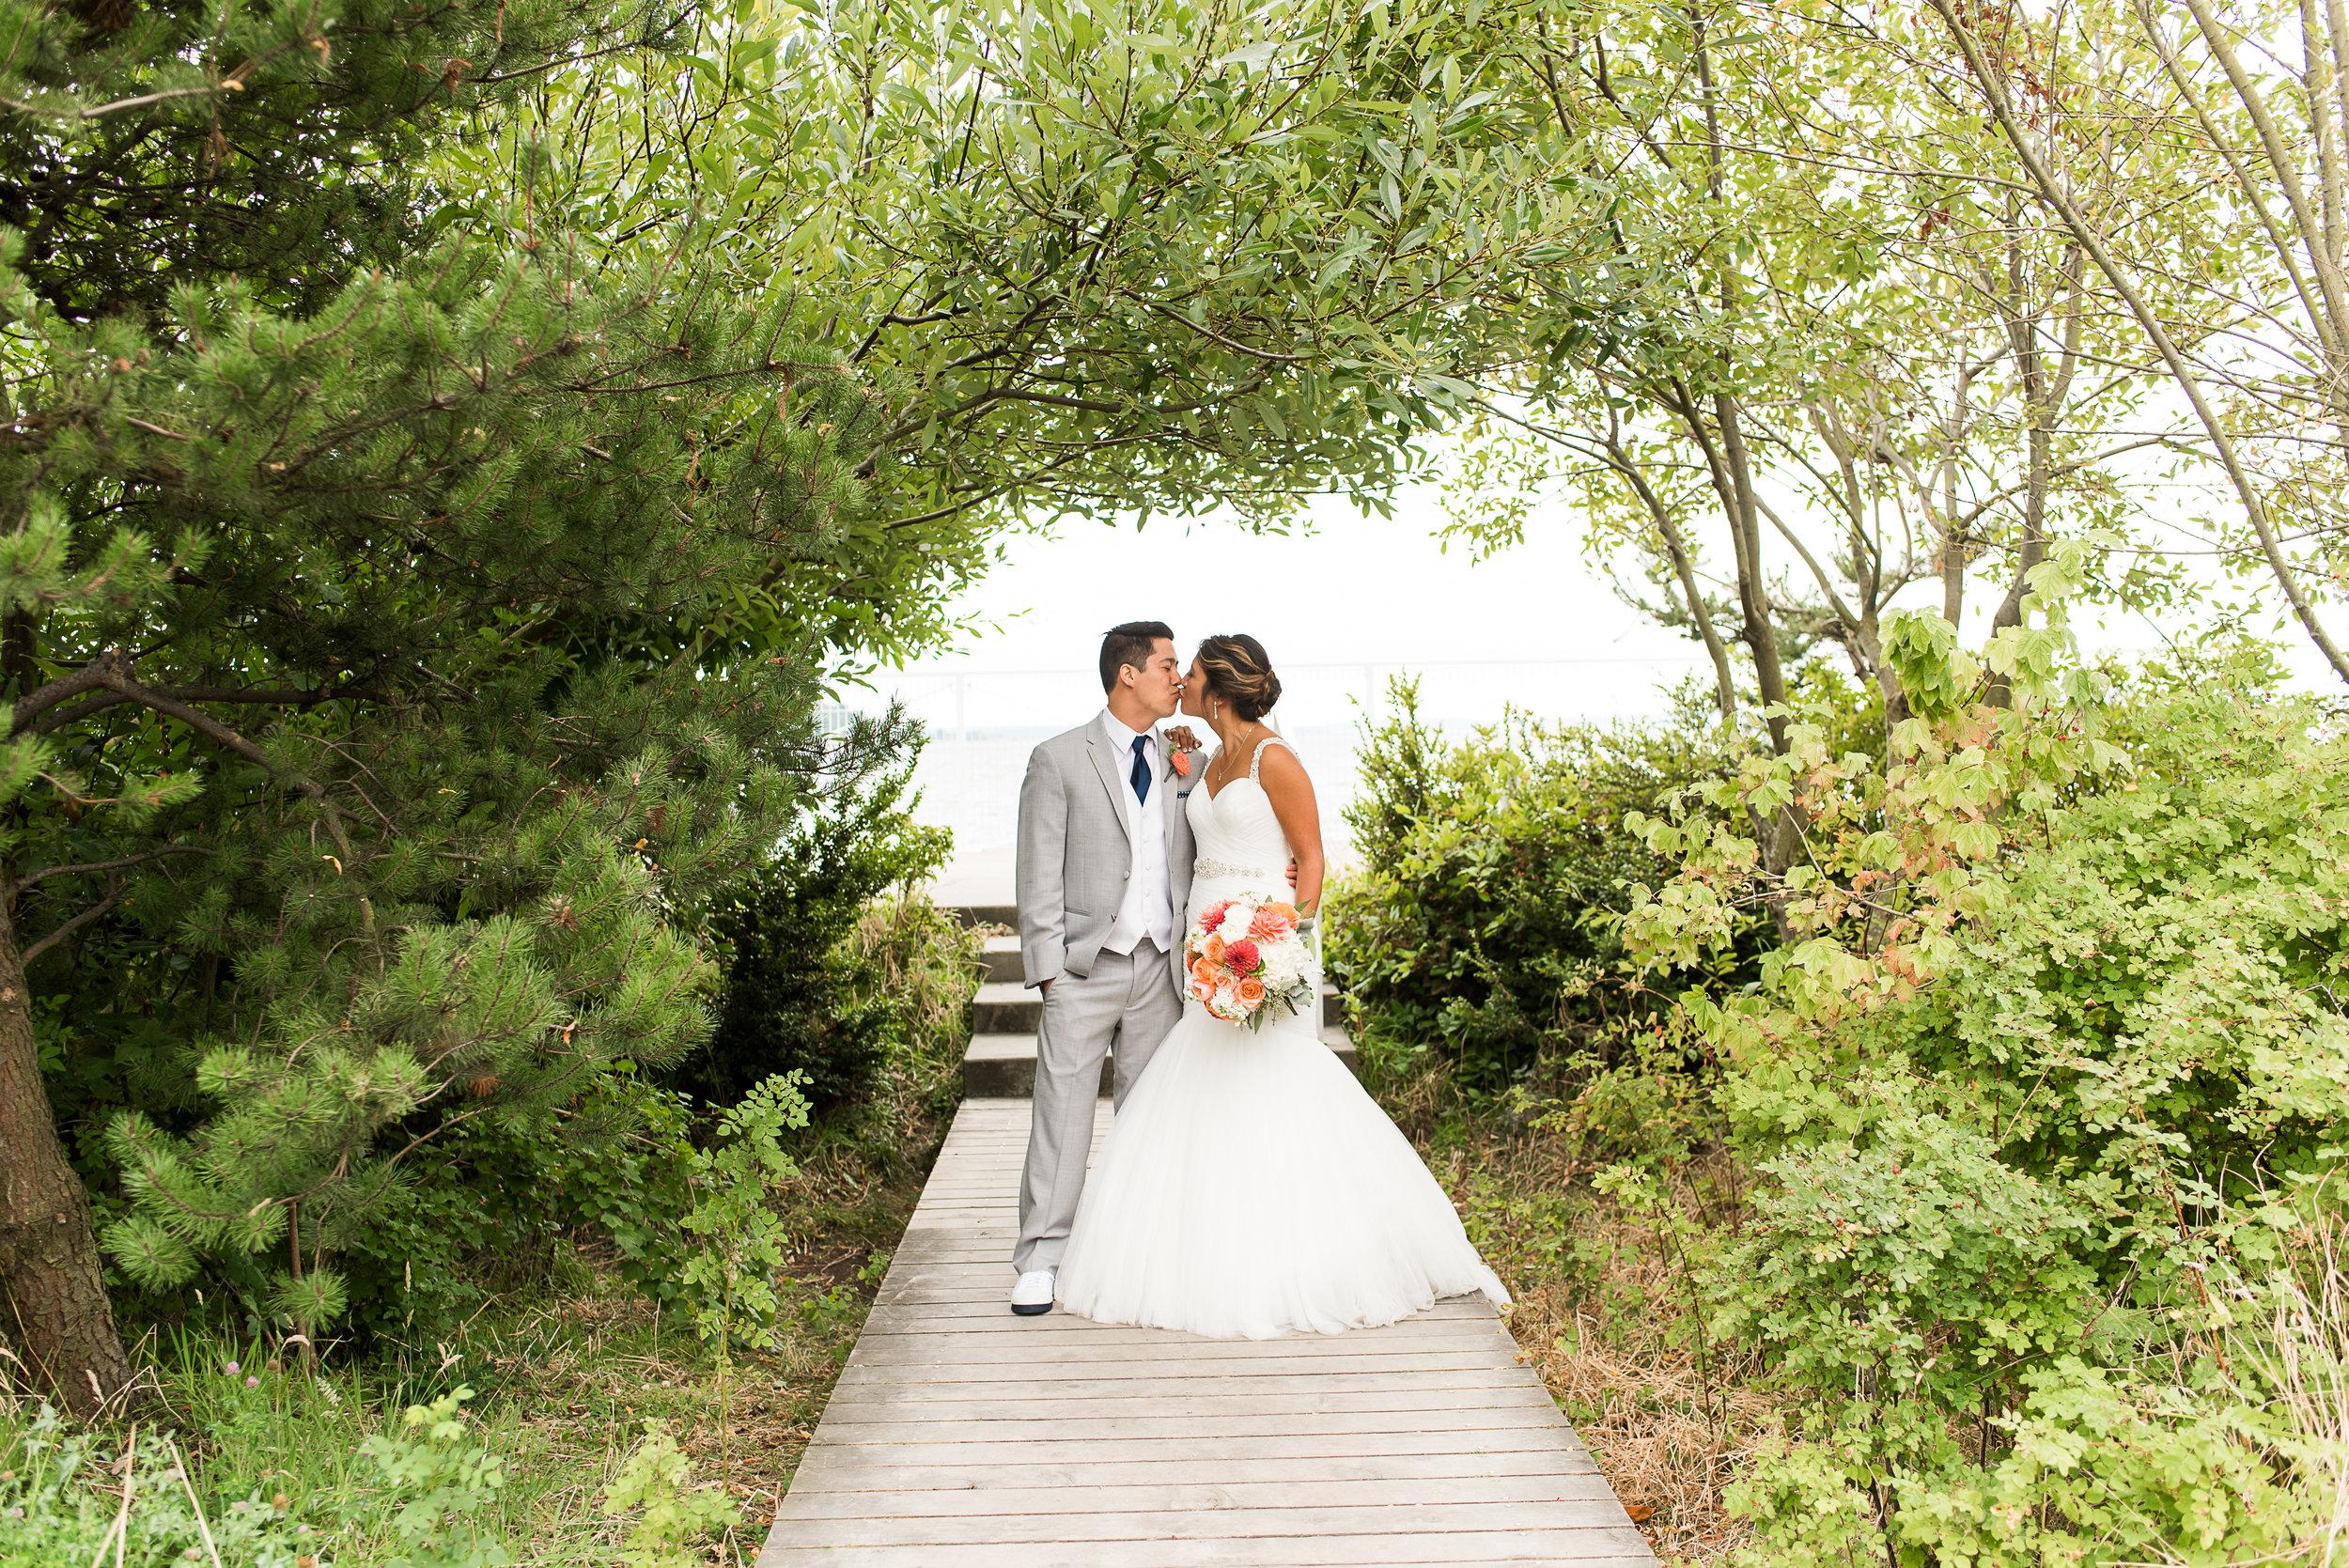 DJ-wedding-Van-Wyhe-Photography-152.jpg